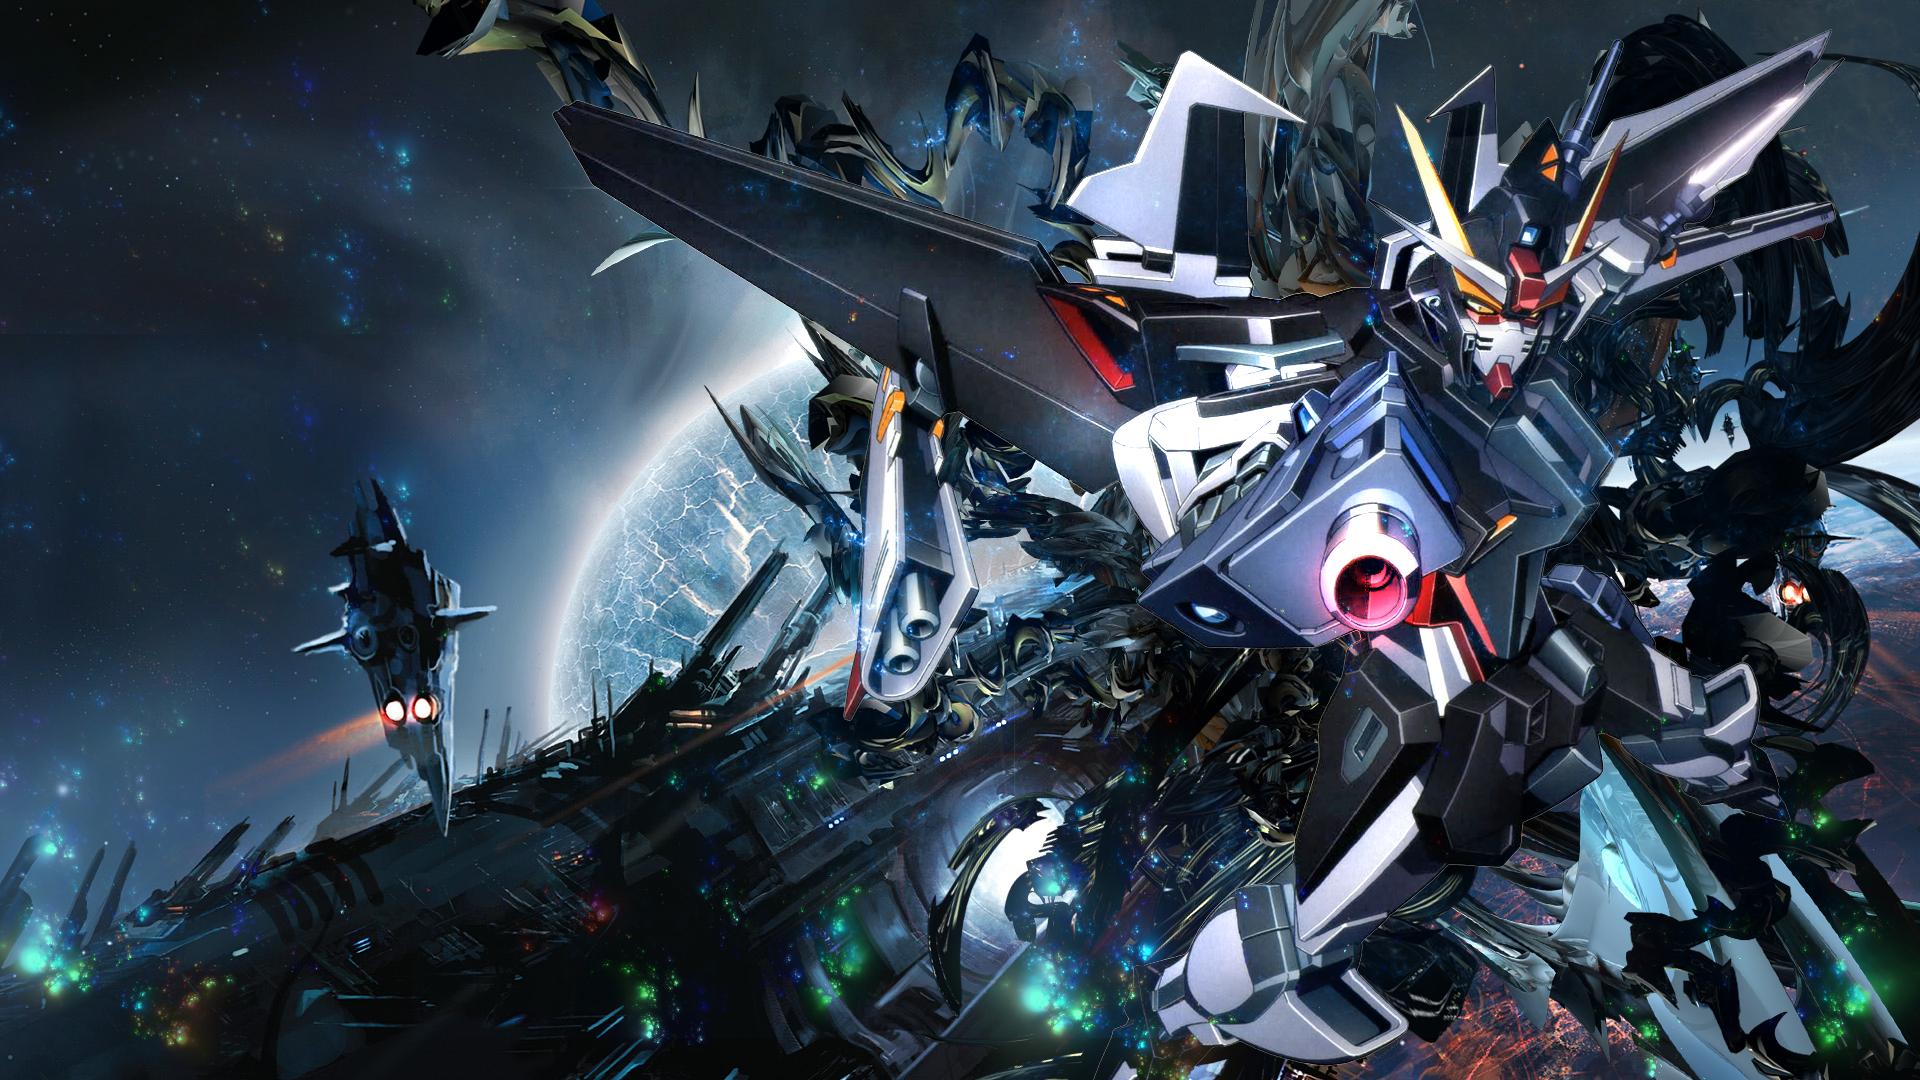 Gundam Deathscythe Wallpapers at Movies Monodomo 1920x1080